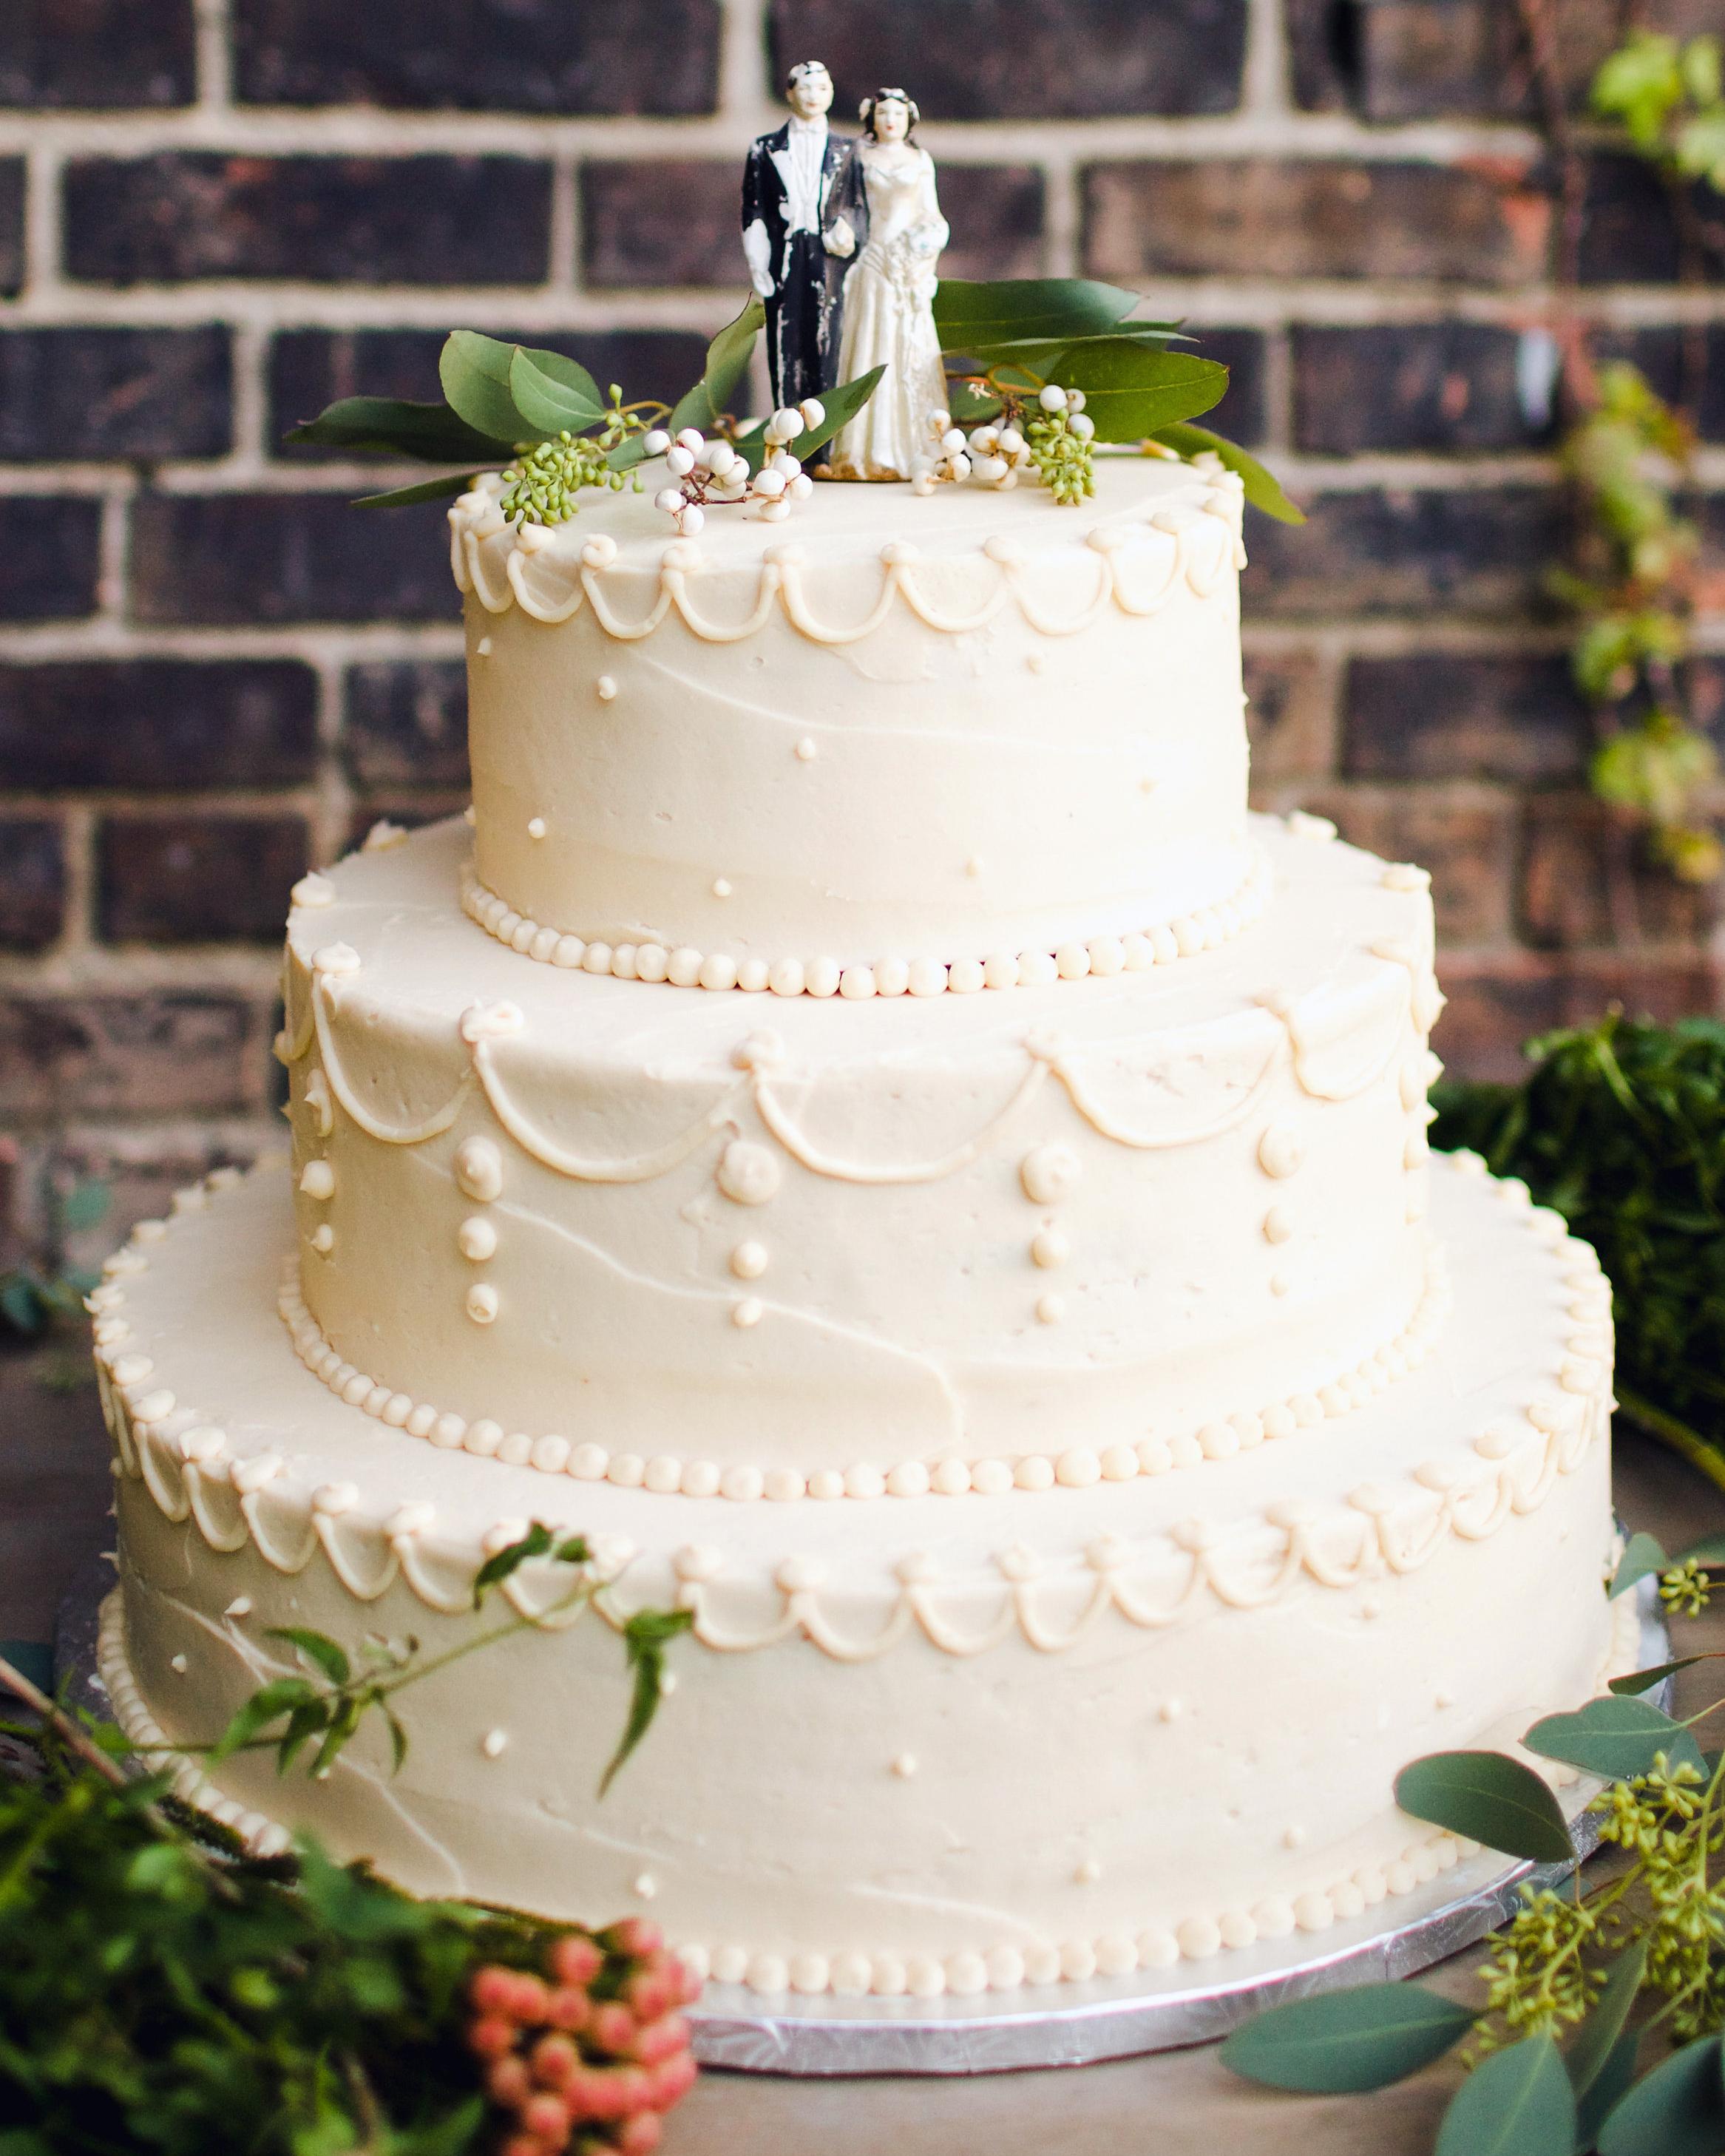 lauren-jake-wedding-cake-7391-s111838-0315.jpg